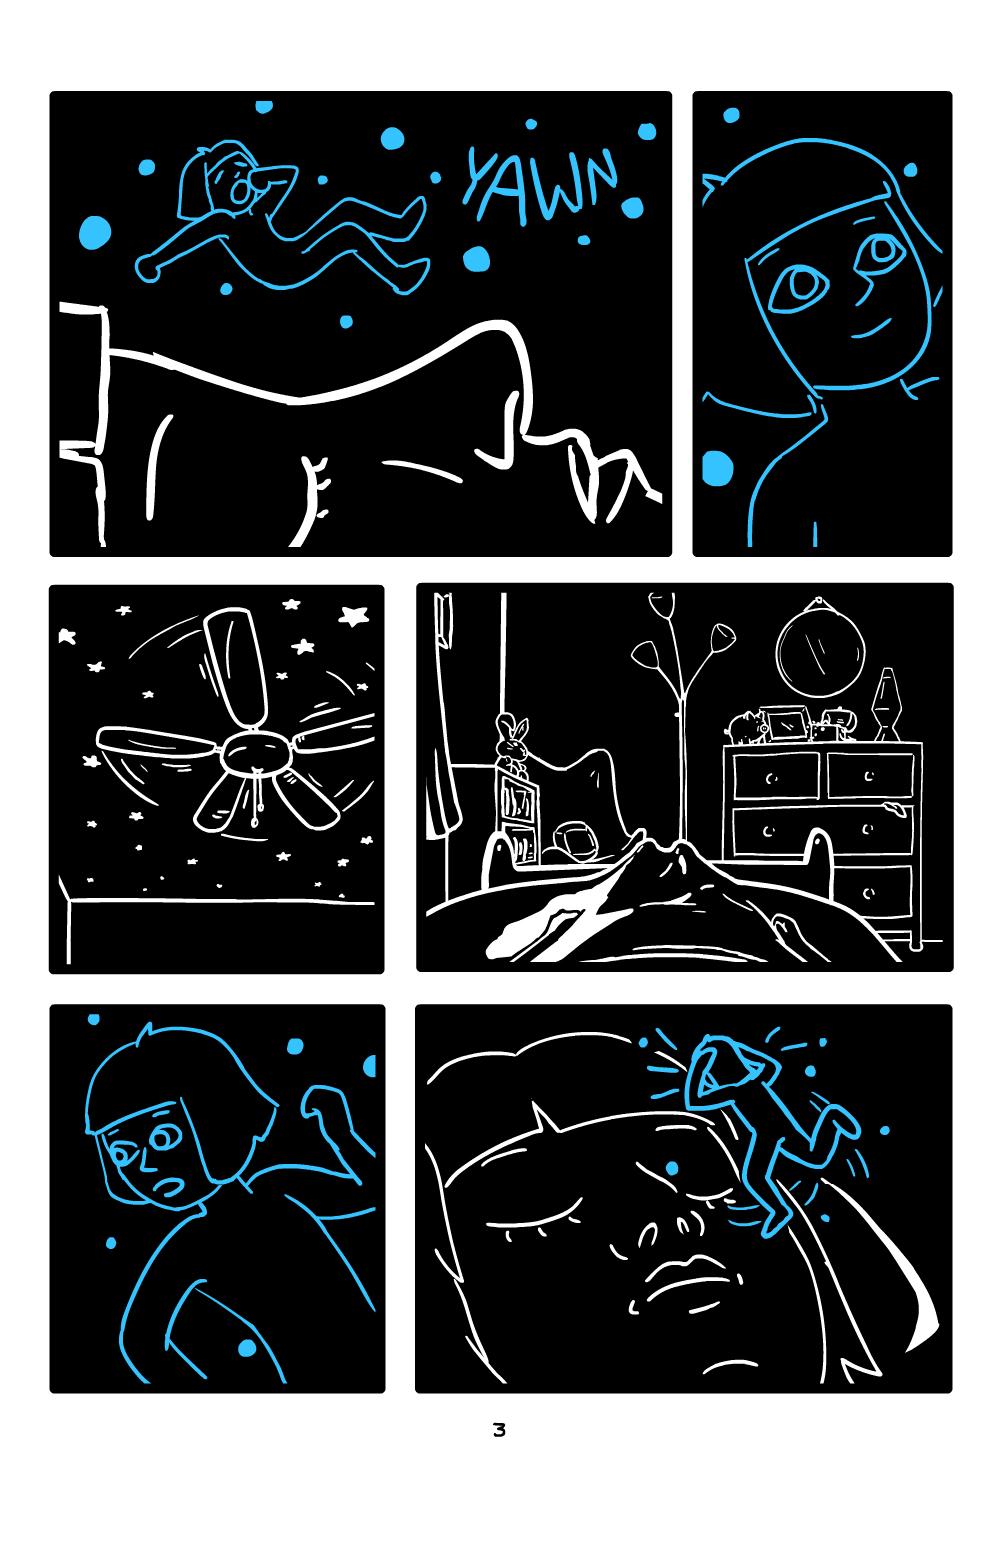 The-Body-Sleeps-9-15-03.jpg